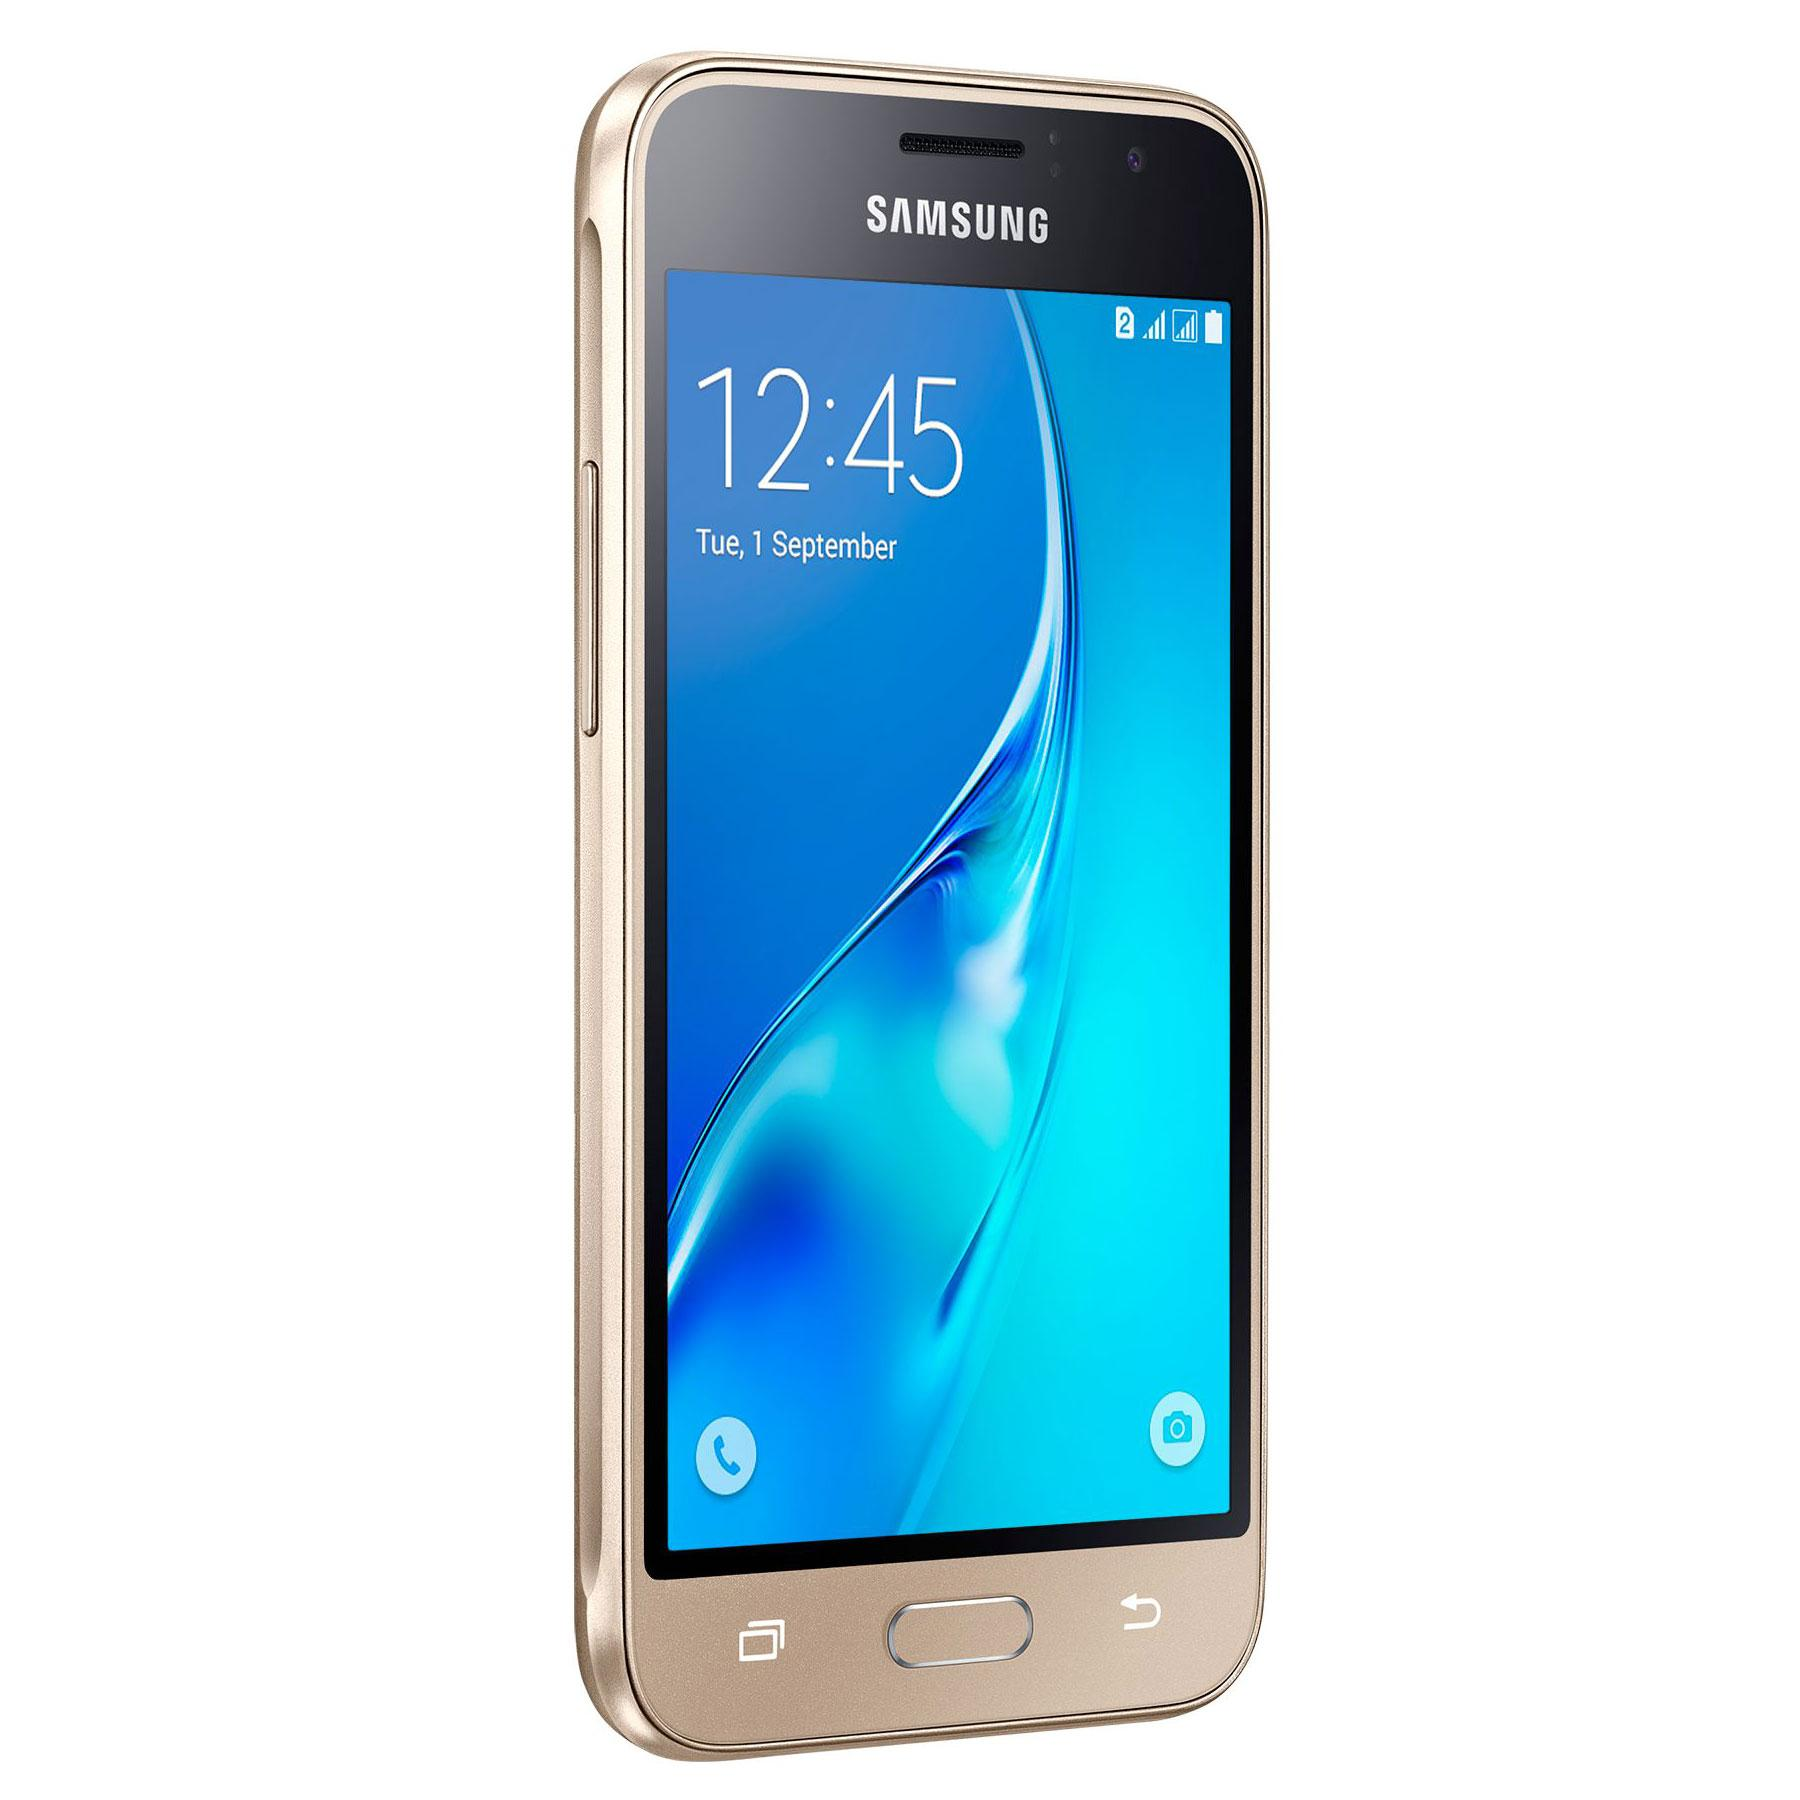 Galaxy J1 (2016) 8 Go - Or - Débloqué